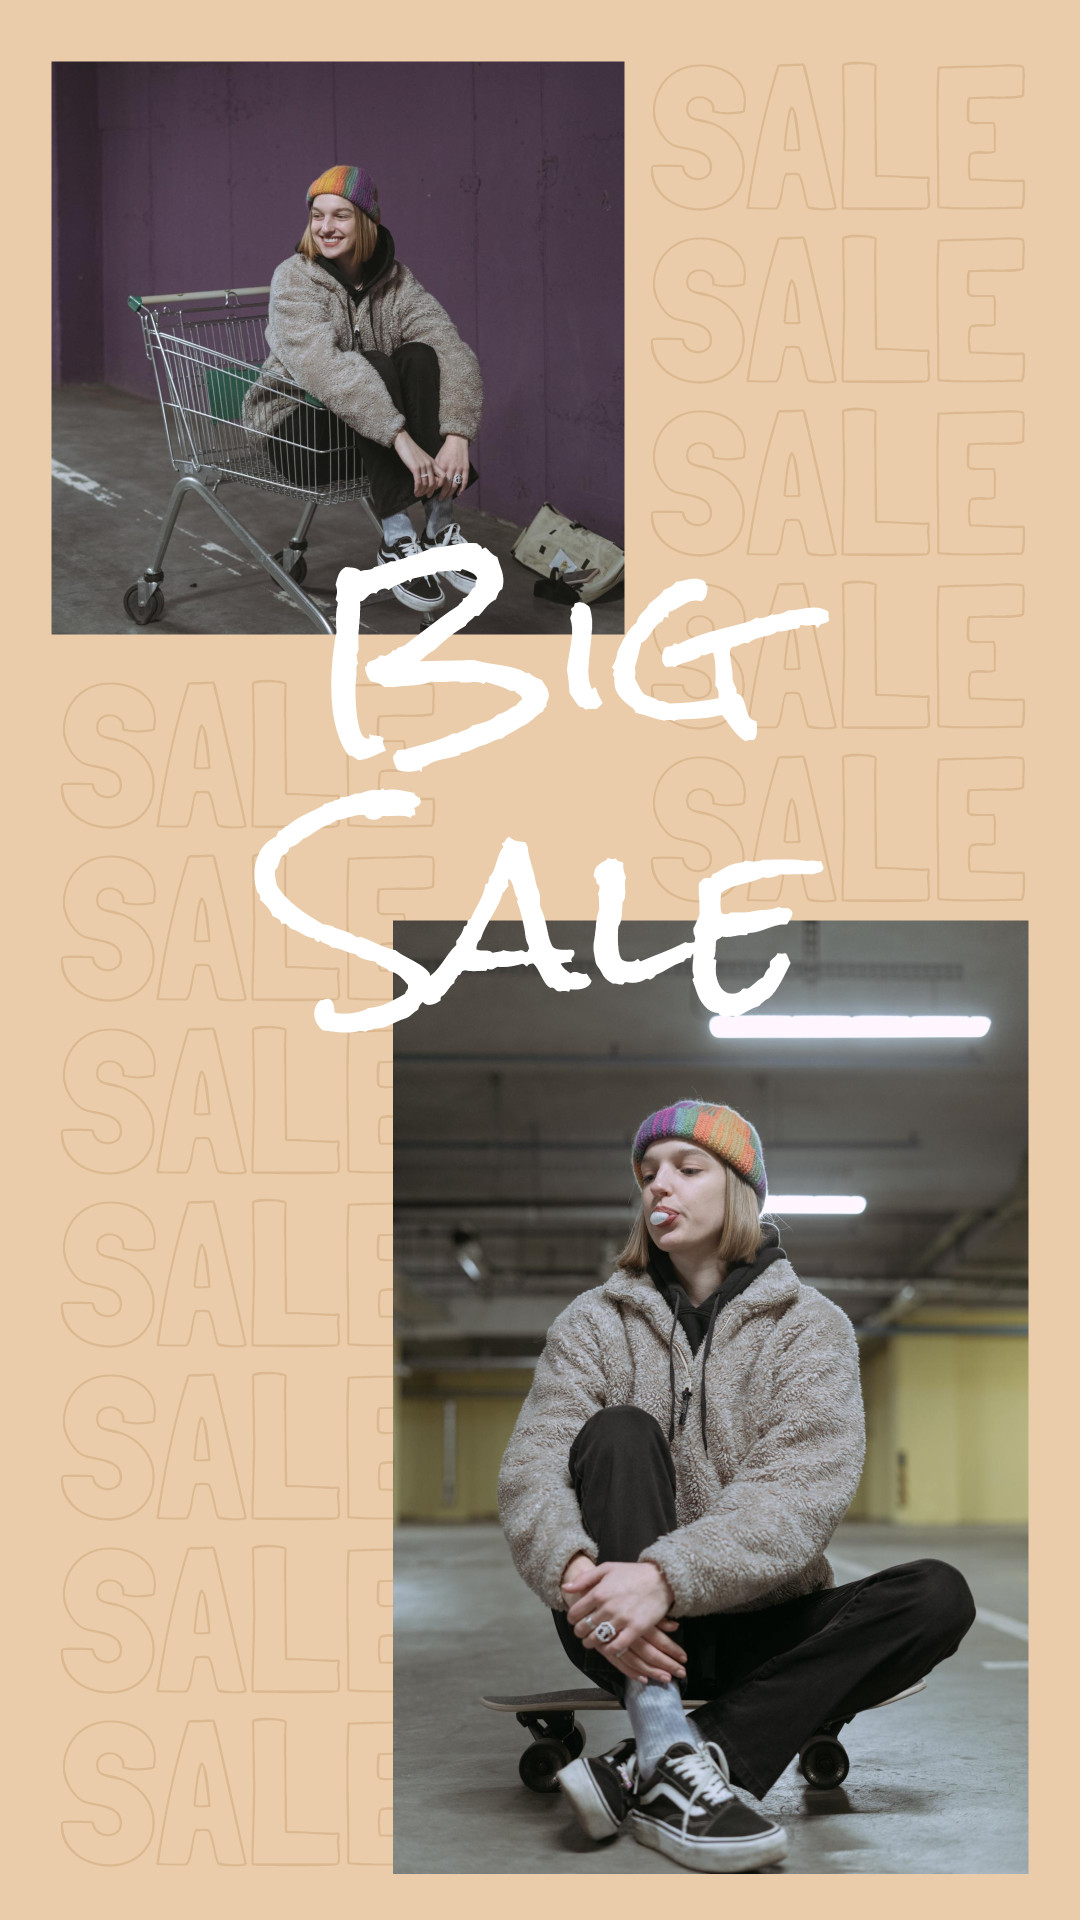 Big sale urban instagram story template